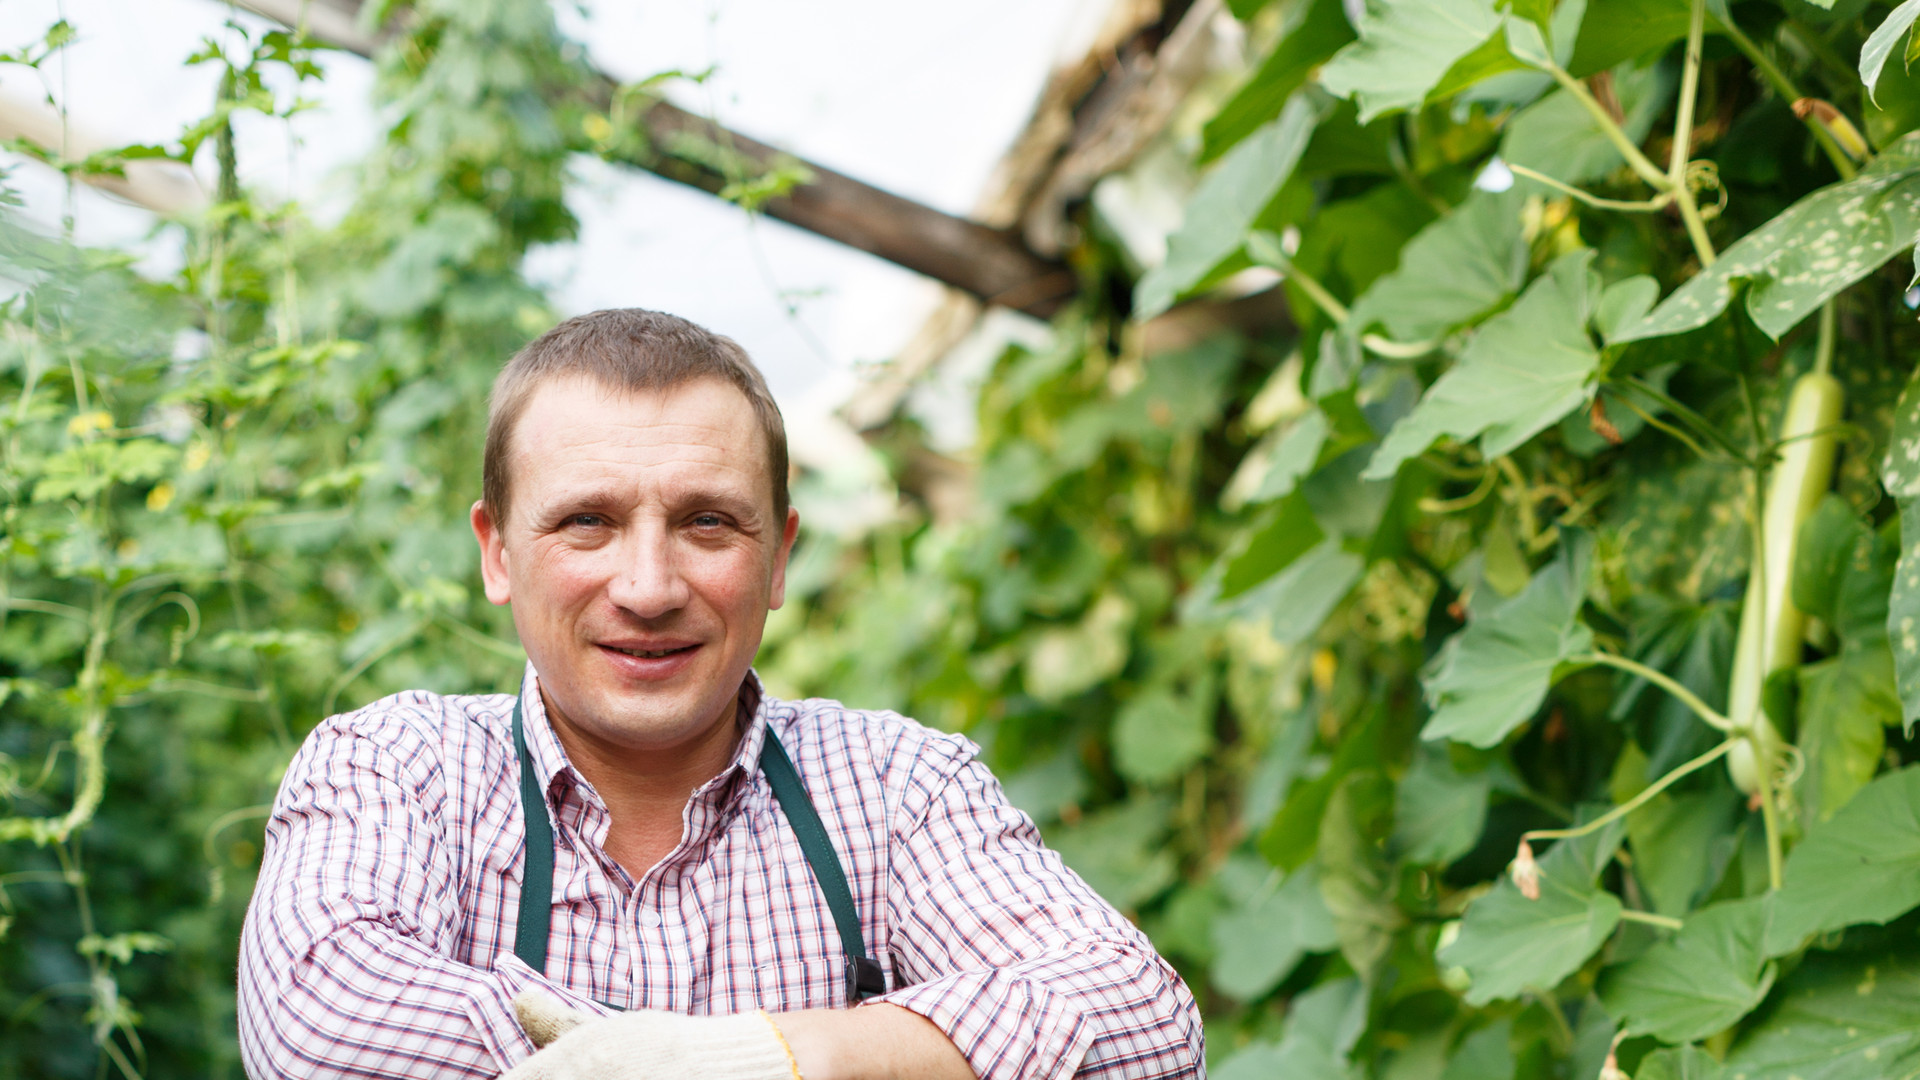 Portrait of adult worker harvesting fres